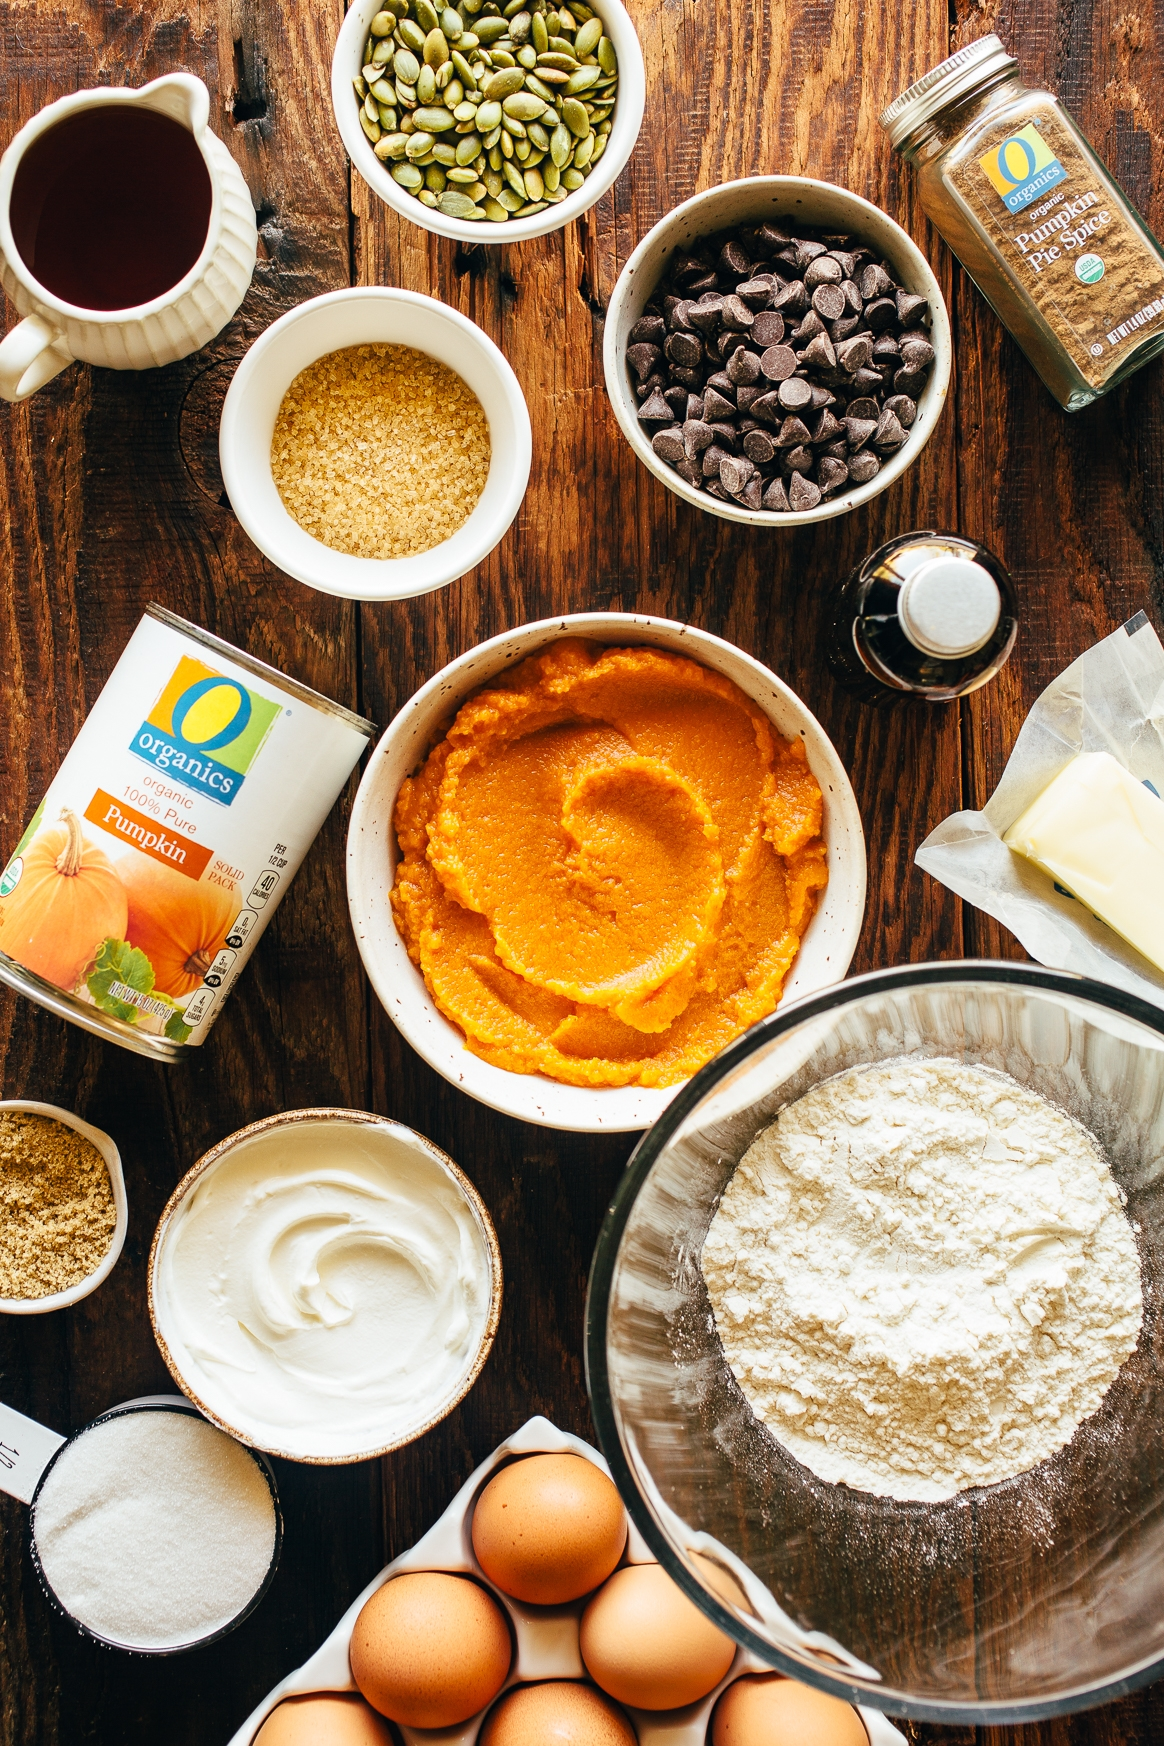 Chocolate Chip Pumpkin Skillet Cake Ingredients